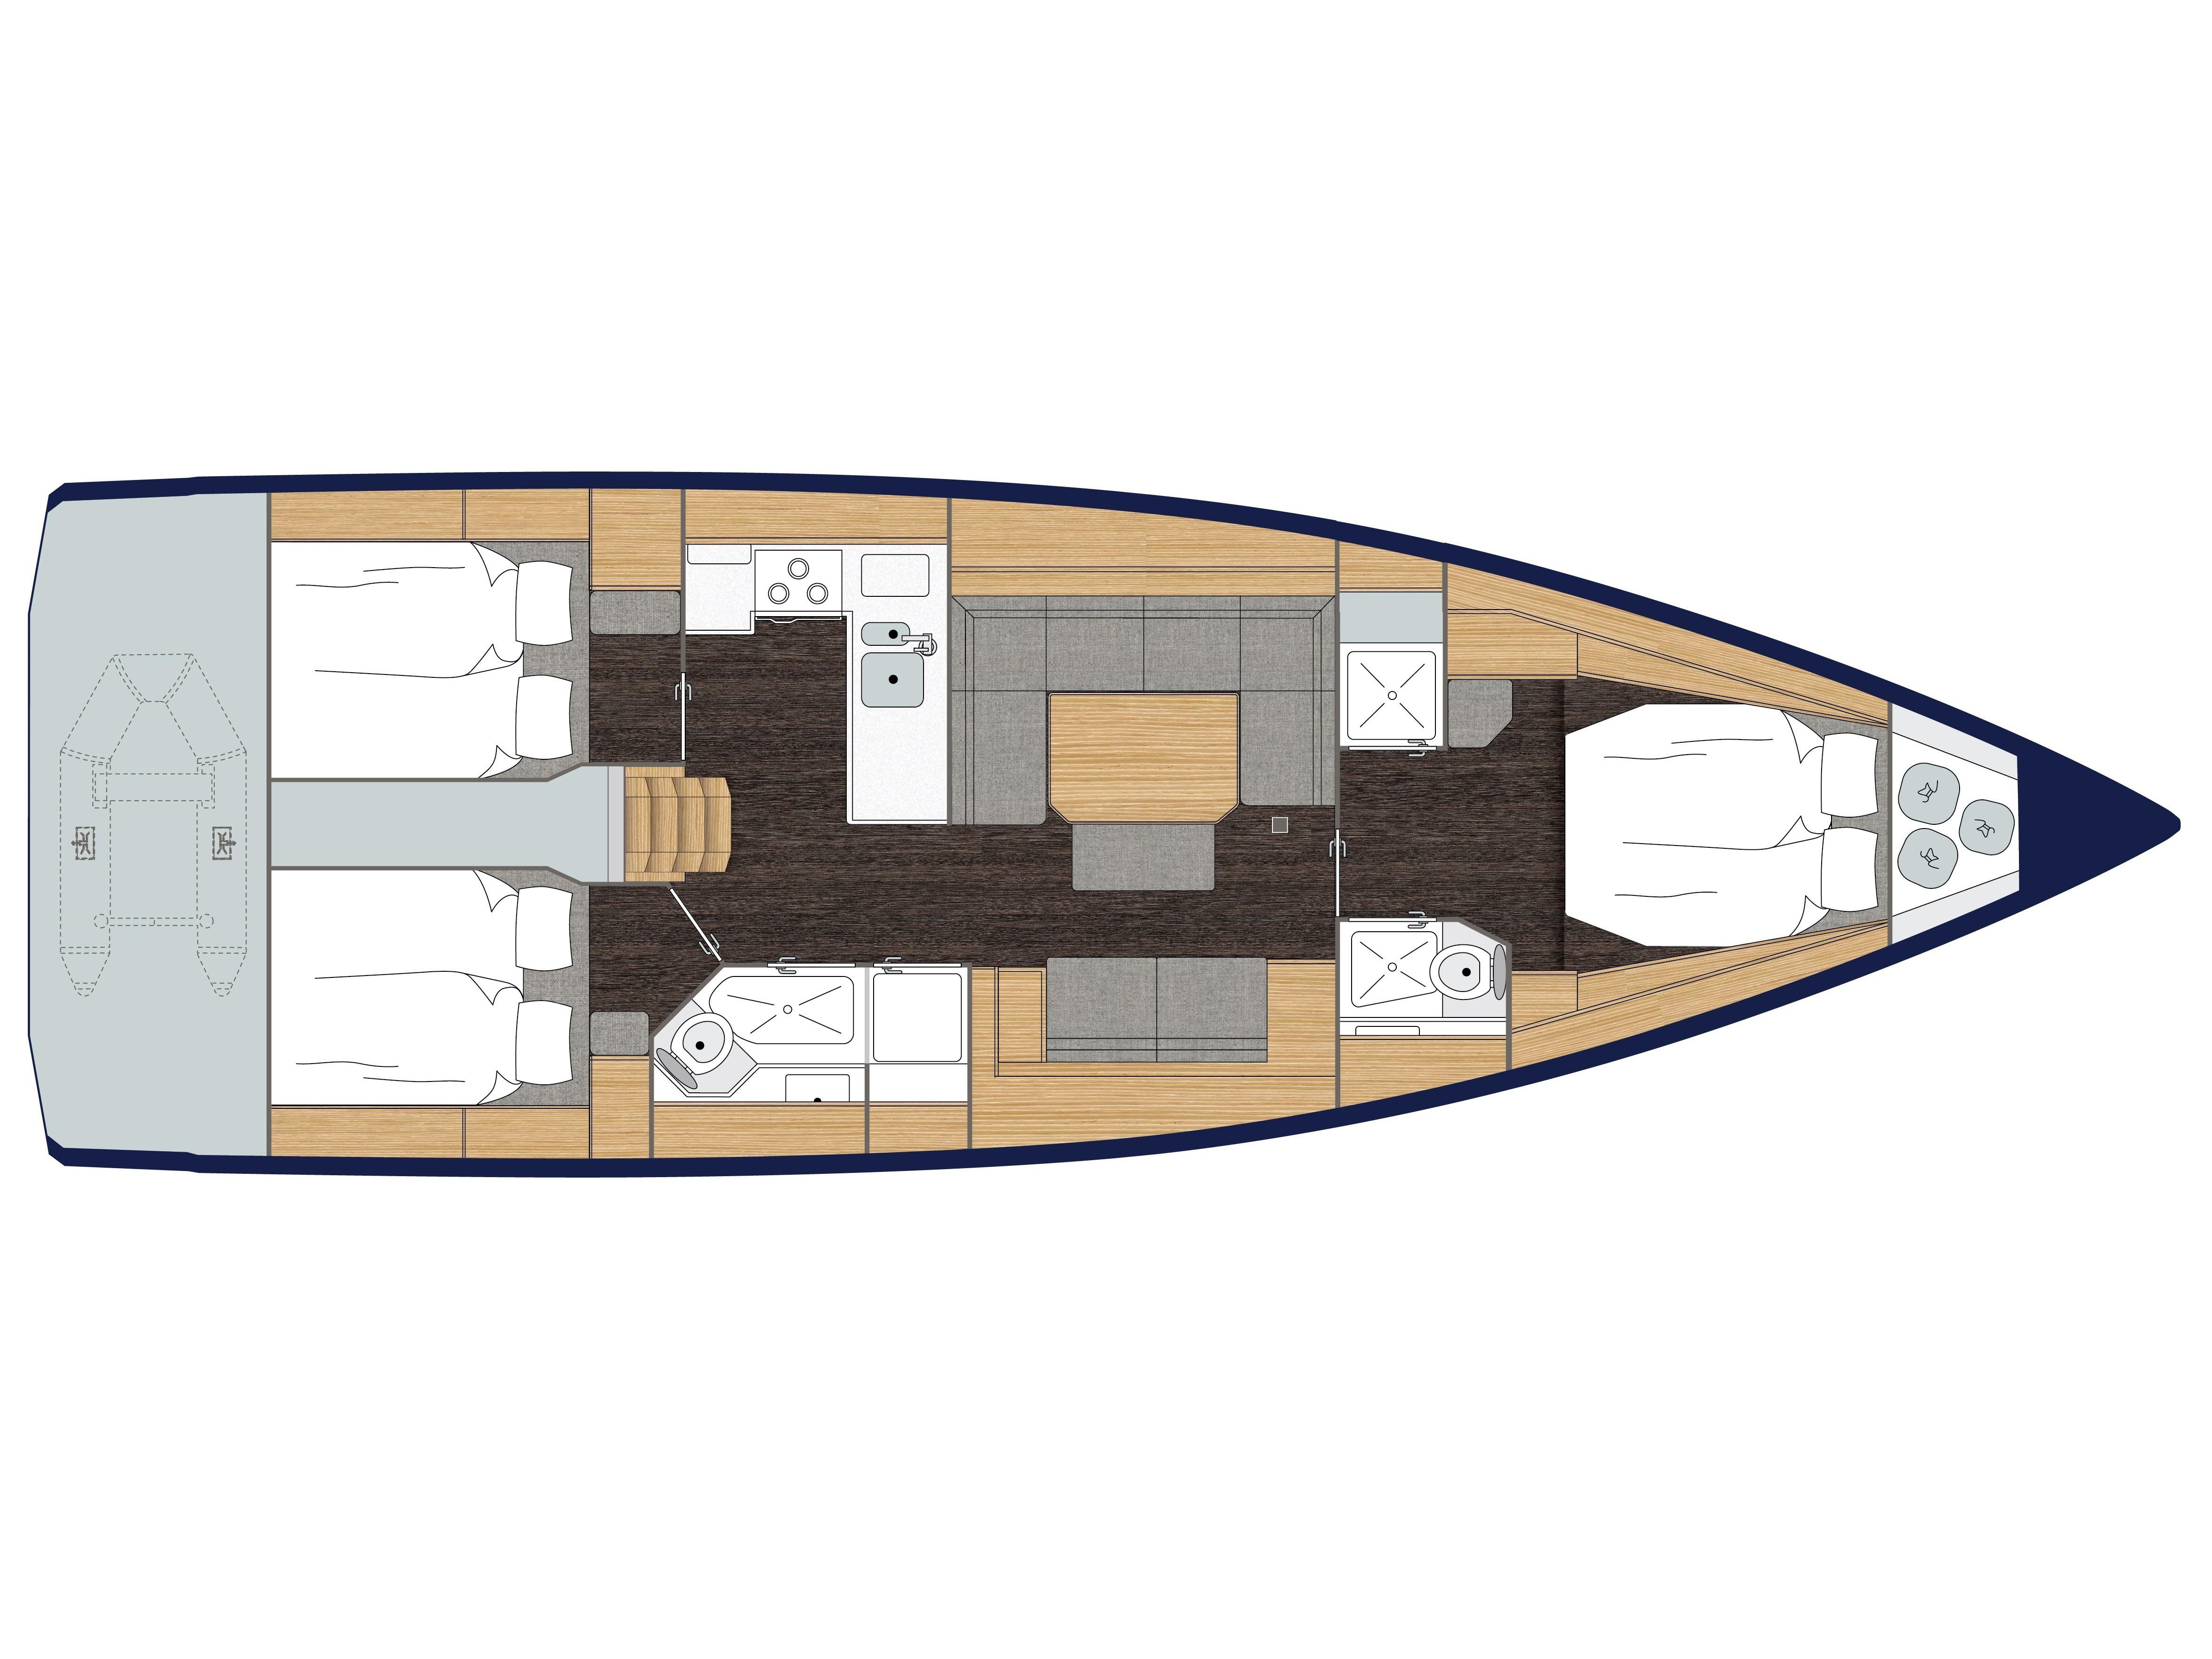 S/Y - Bavaria C45 Style - 3 Cabins - Built 2019